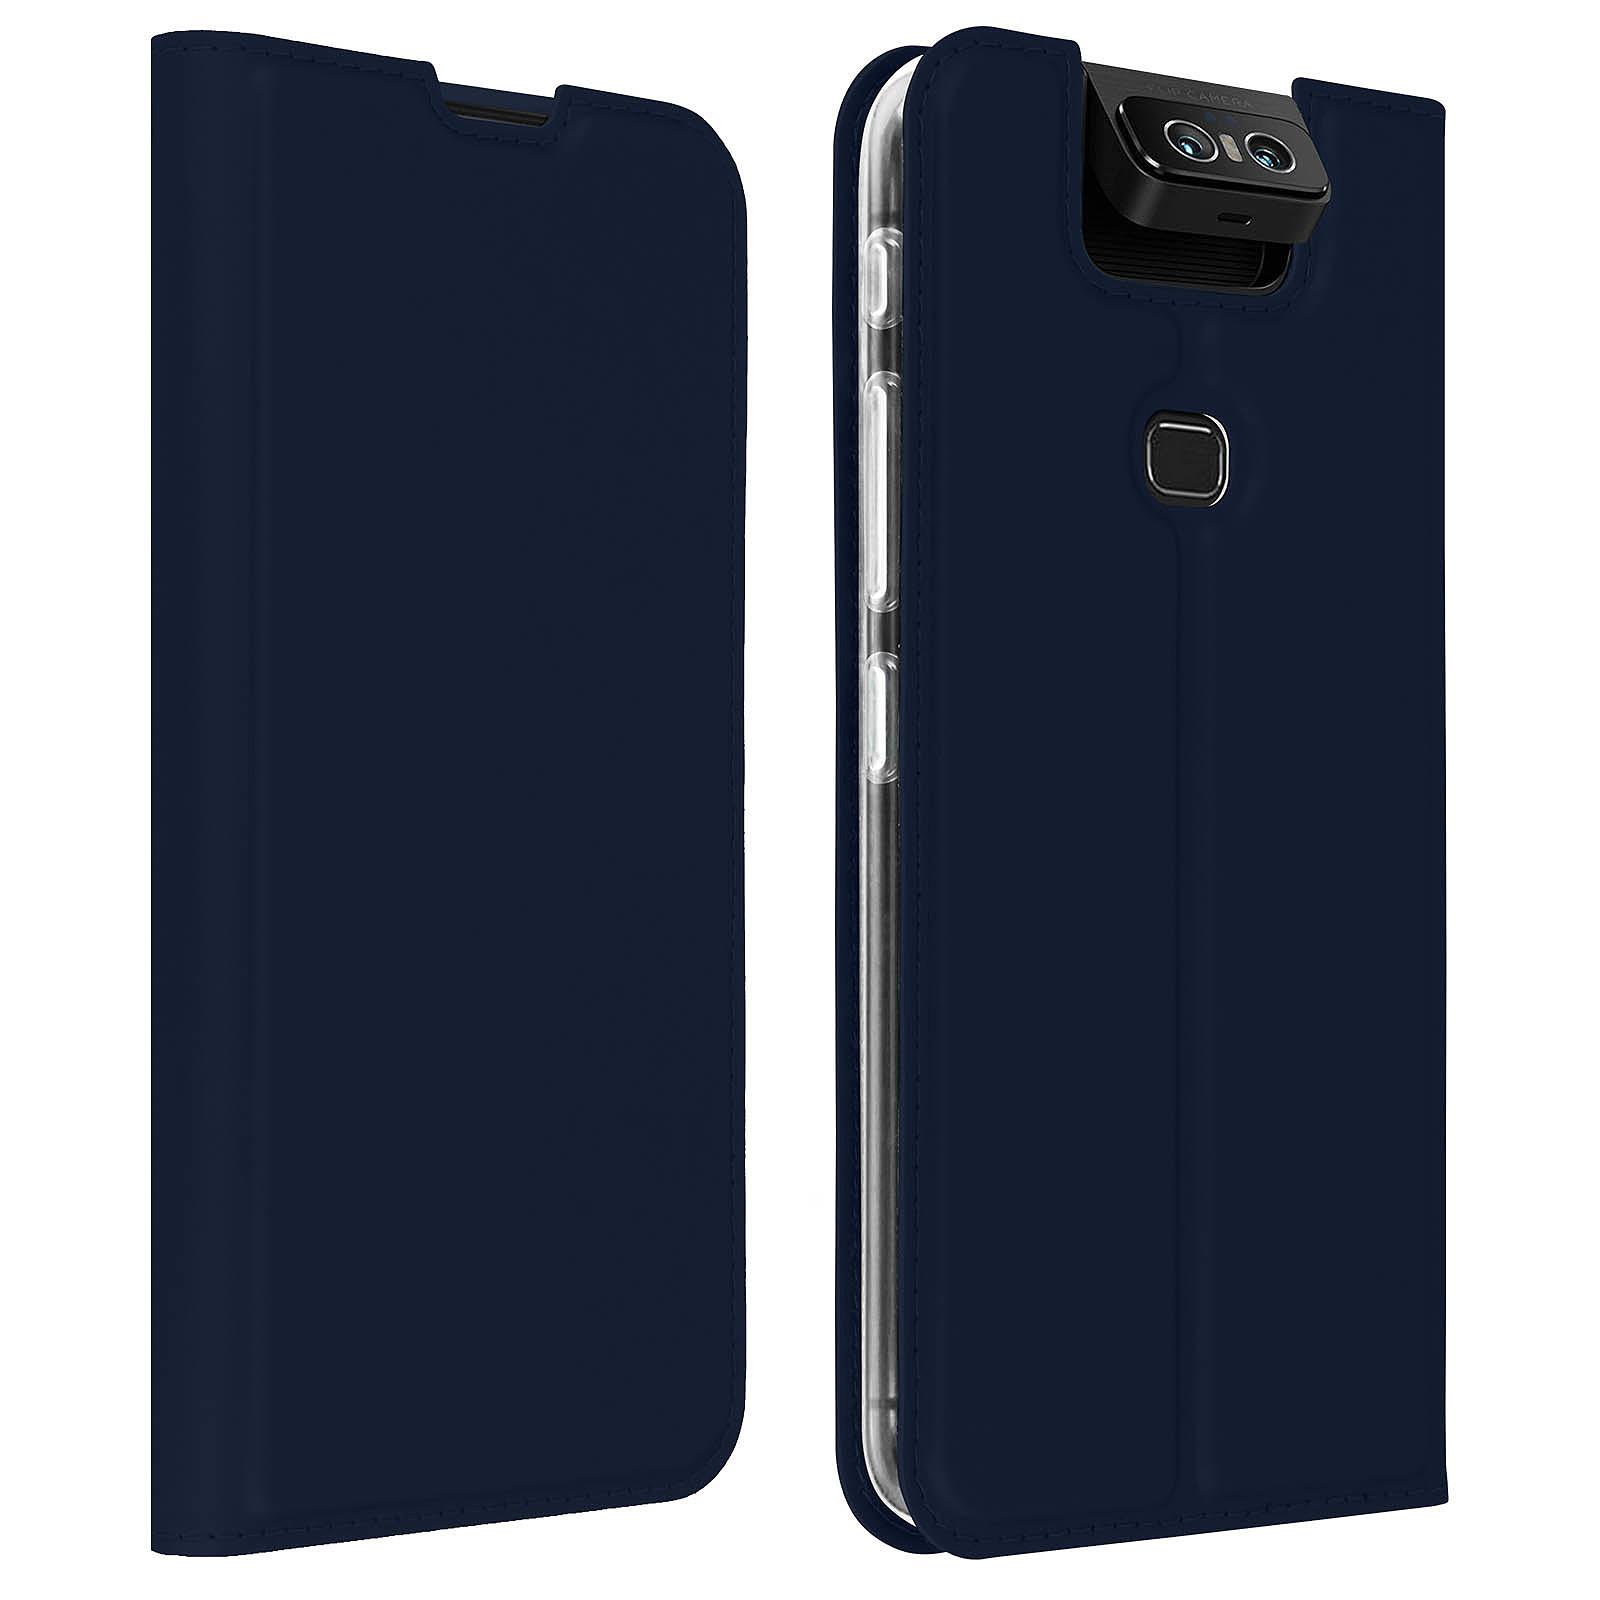 Avizar Etui folio Bleu Nuit pour Asus ZenFone 6